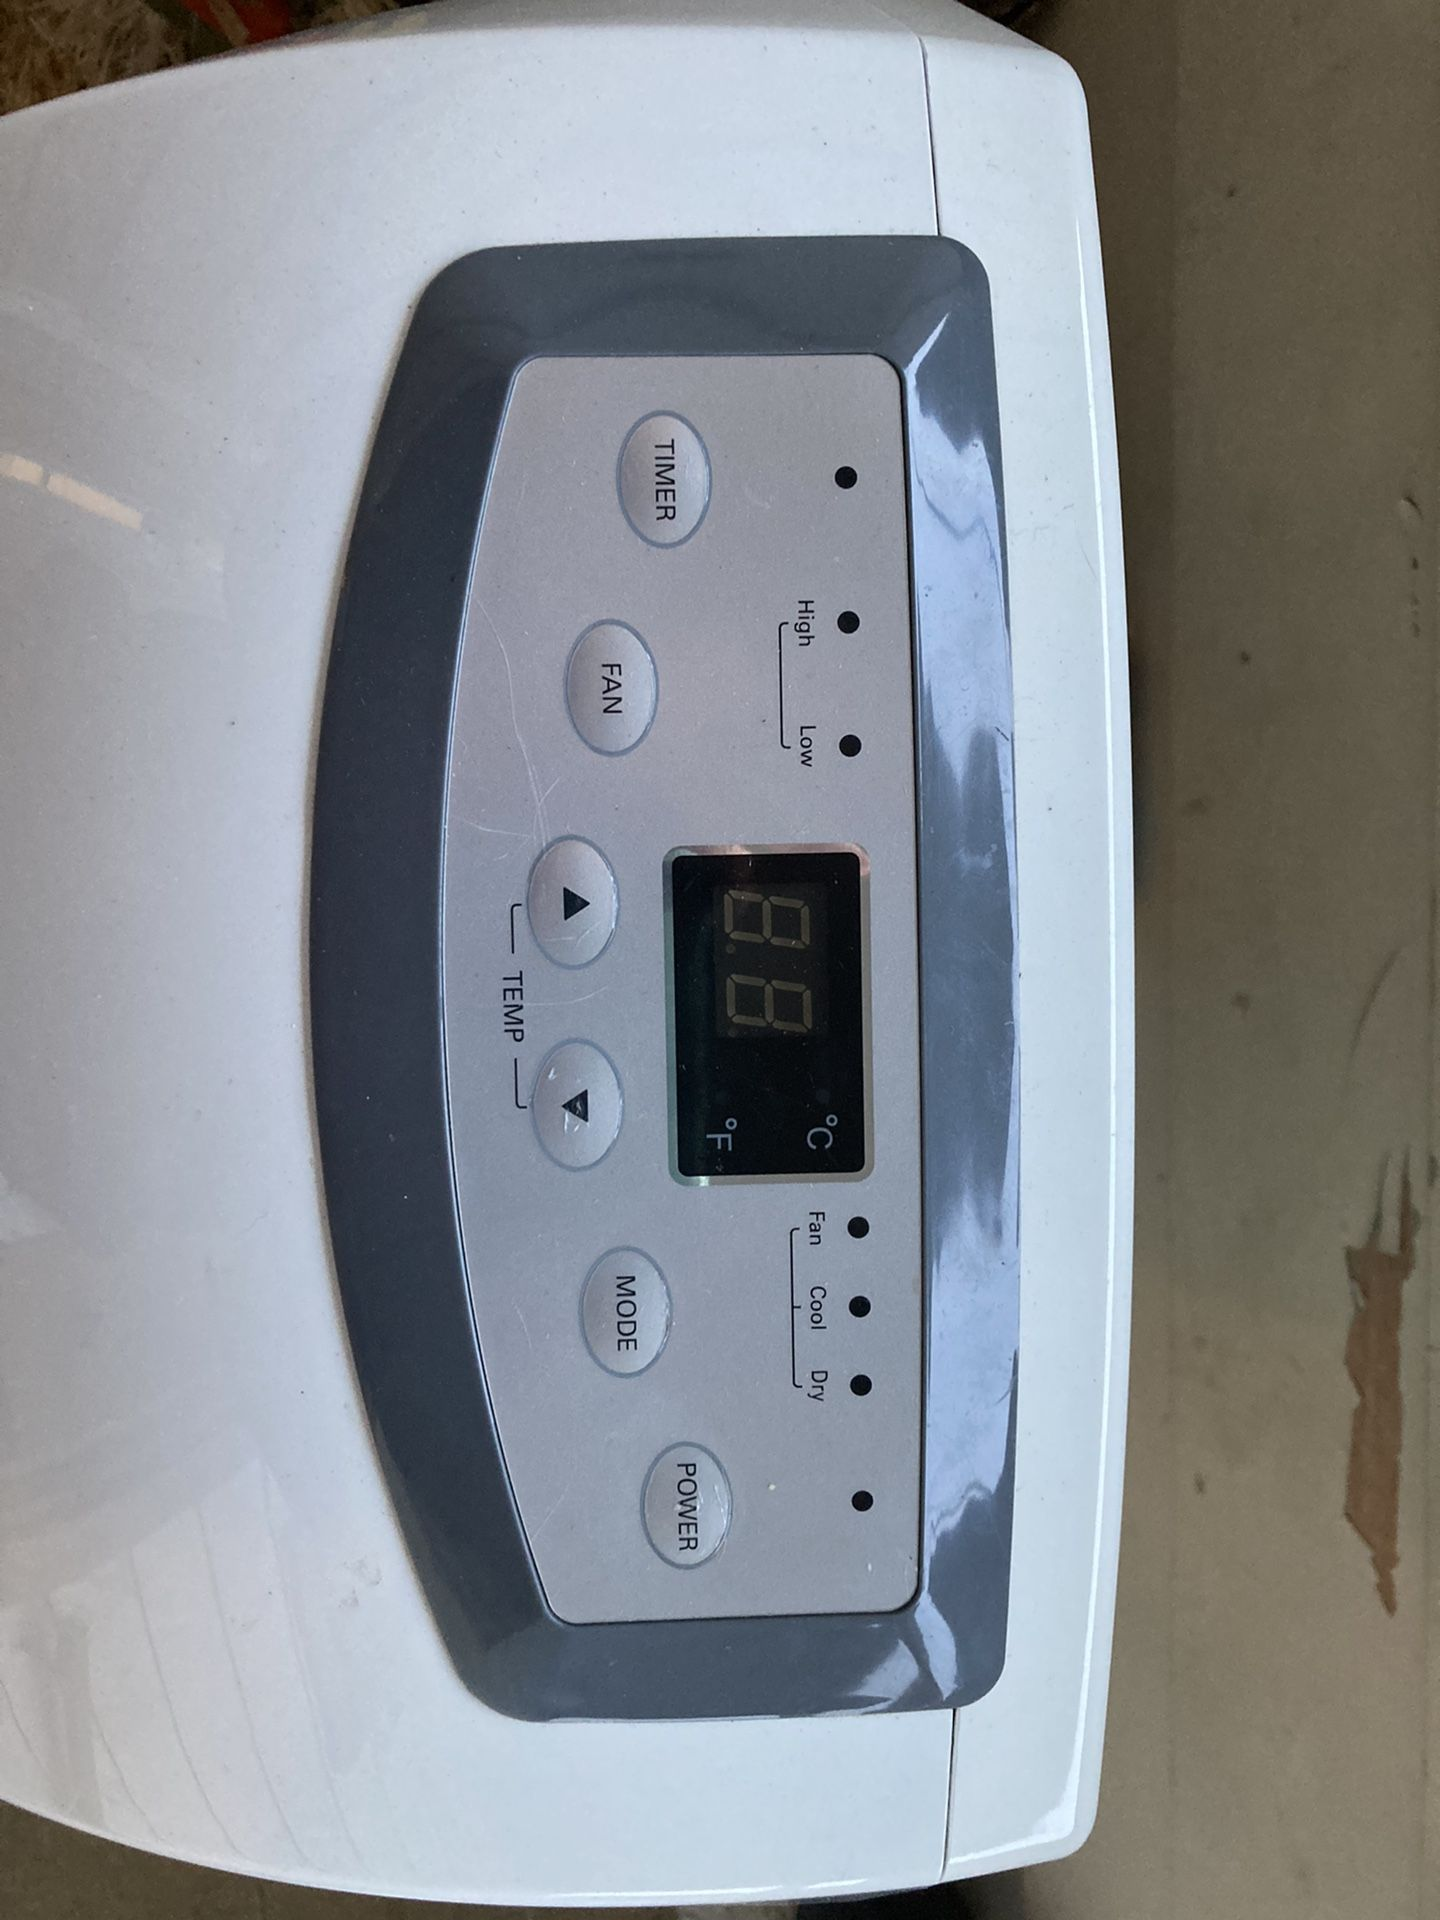 LG Portable Air Condioner